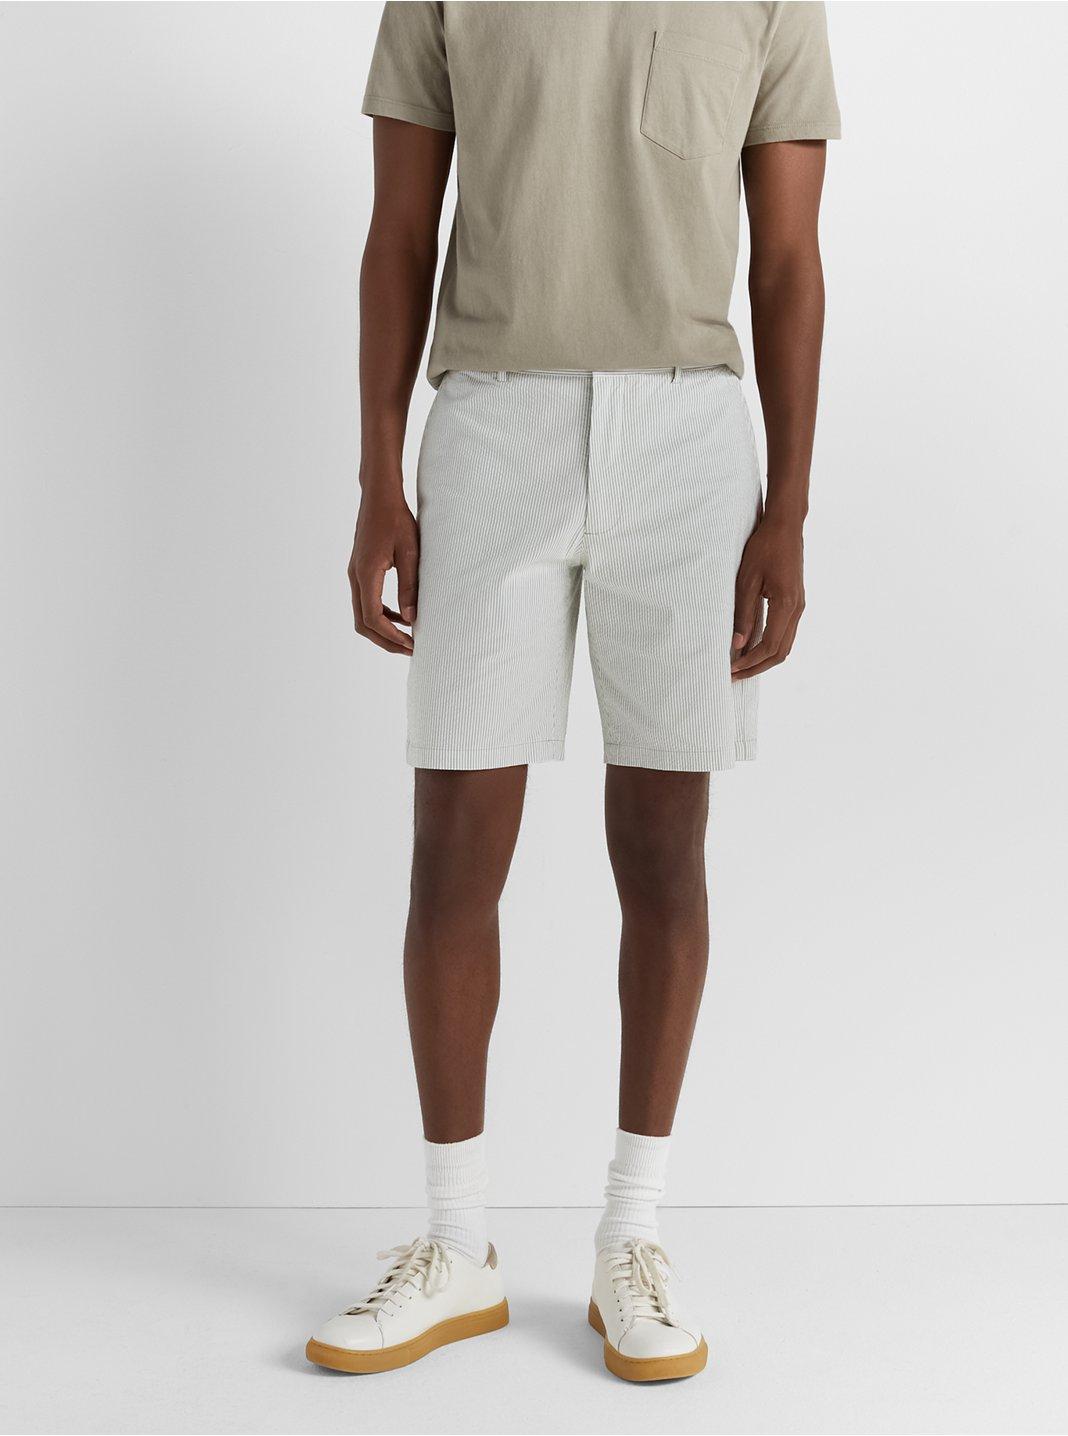 "Maddox Seersucker 9"" Shorts"